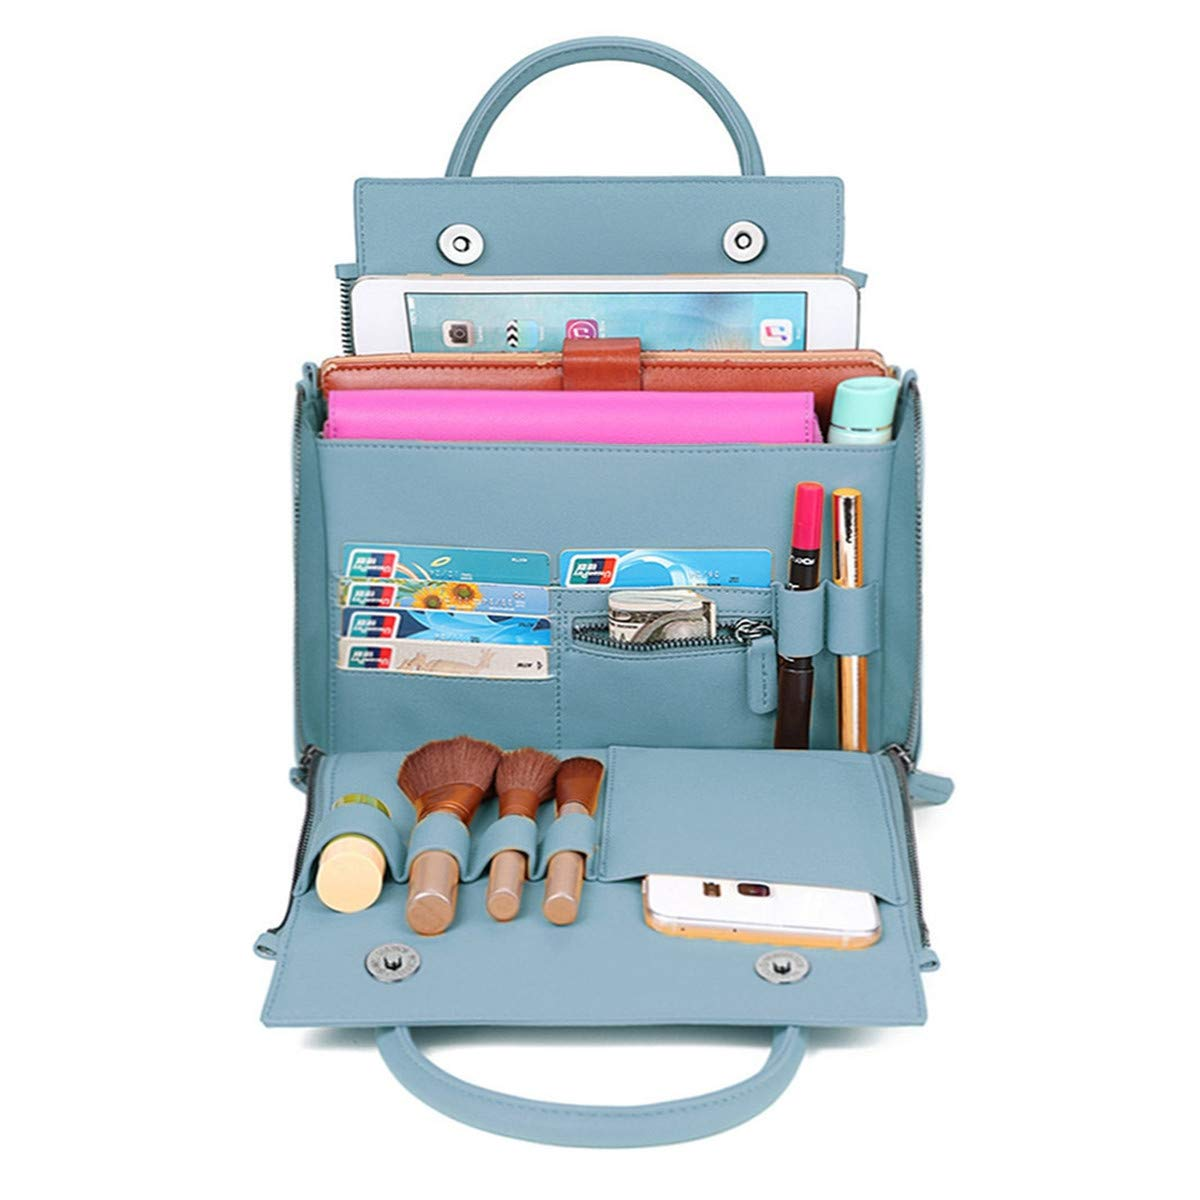 Brenice Travel Makeup Bag, Women Solid Cosmetic Handbag Capacity Bag Multifunction Crossbody Bag Blue 9.25''x 4.75''x 6.5''